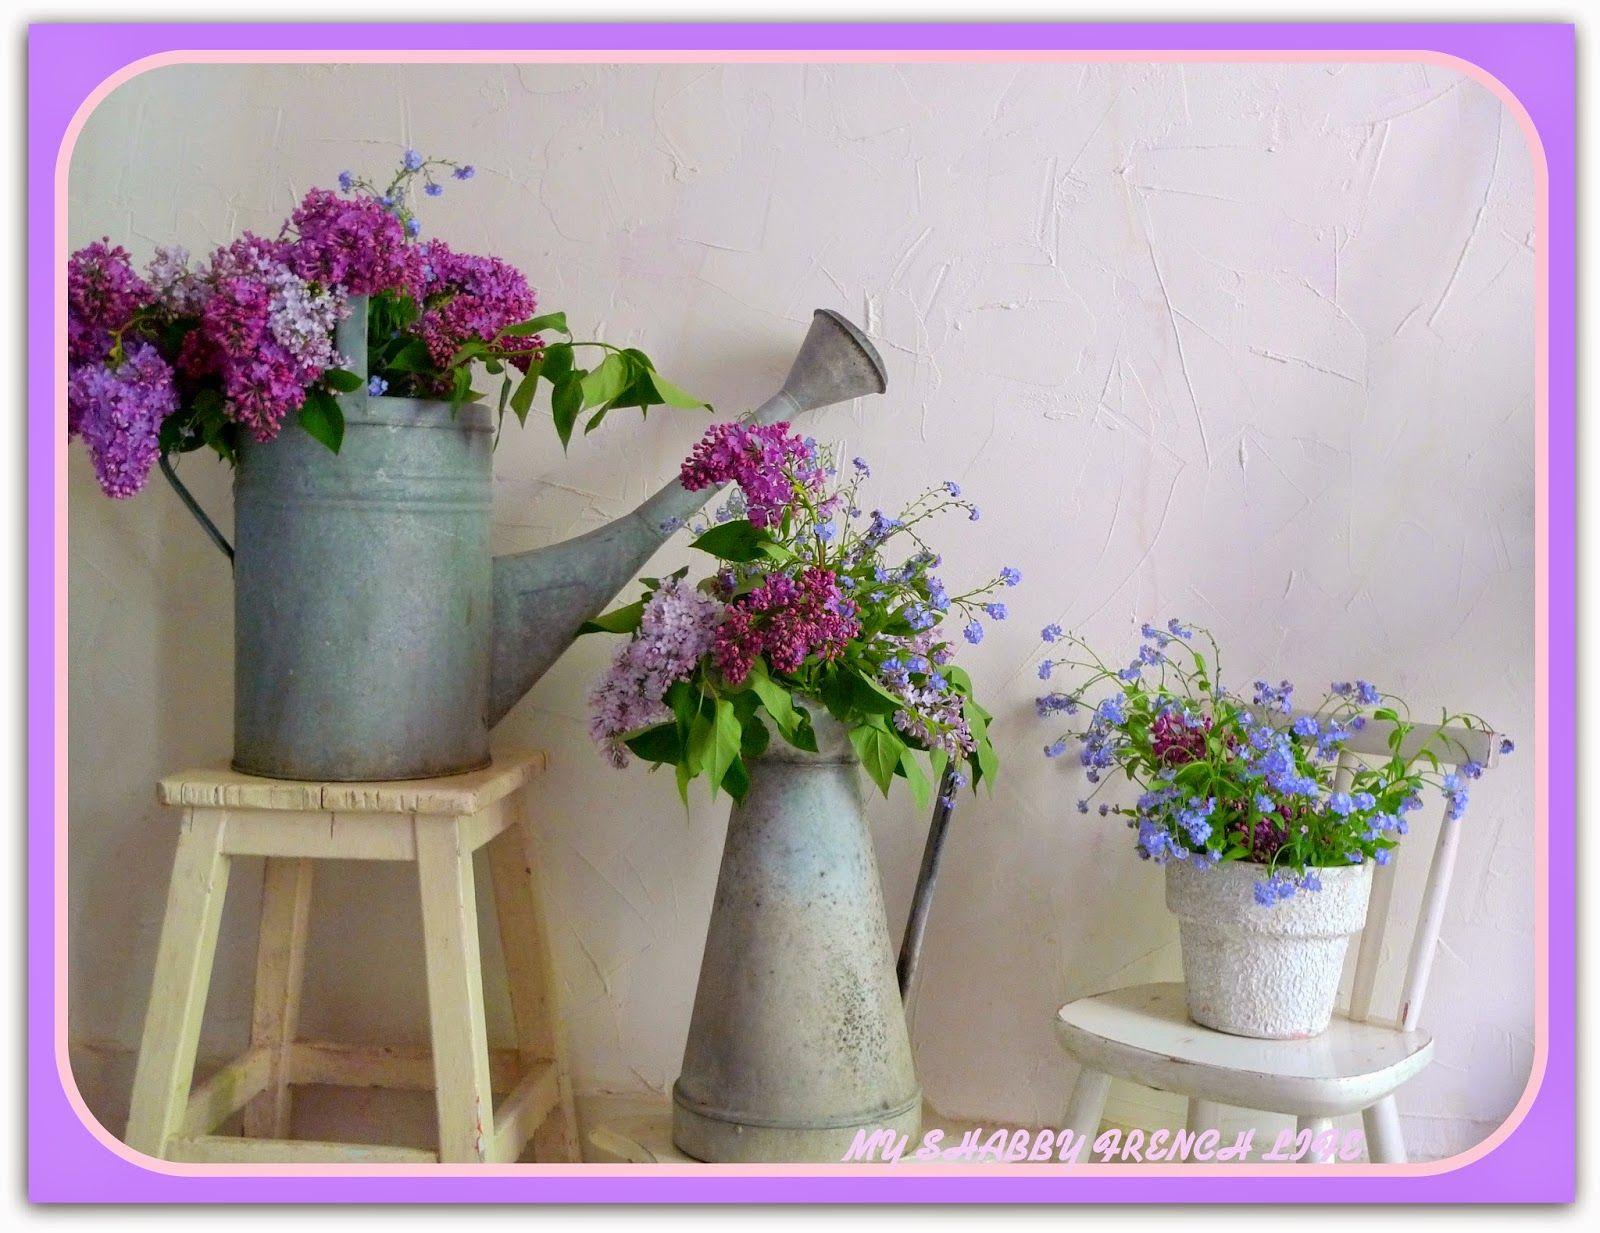 Galvanised Flower Vase Of My Shabby French Life Happy Shabby Spring Fleurs Romantiques Inside My Shabby French Life Happy Shabby Spring